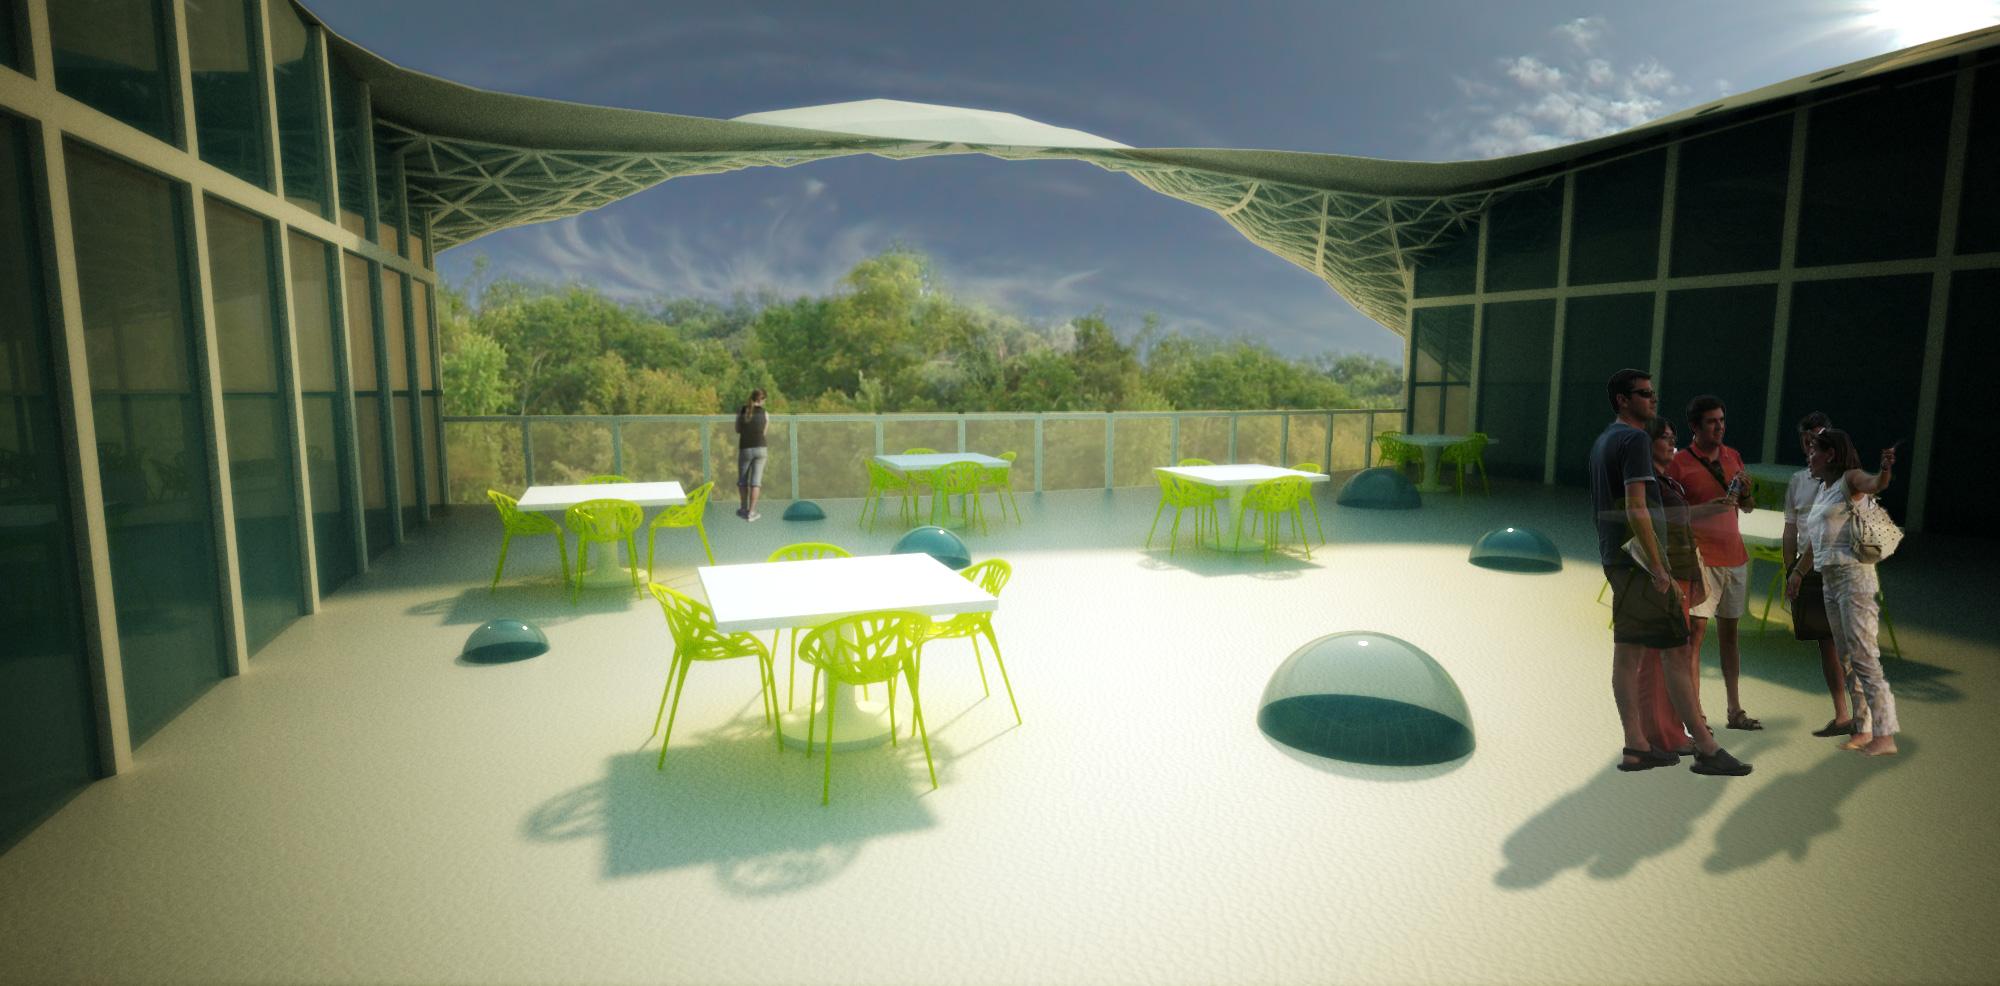 Courtyard Visualization